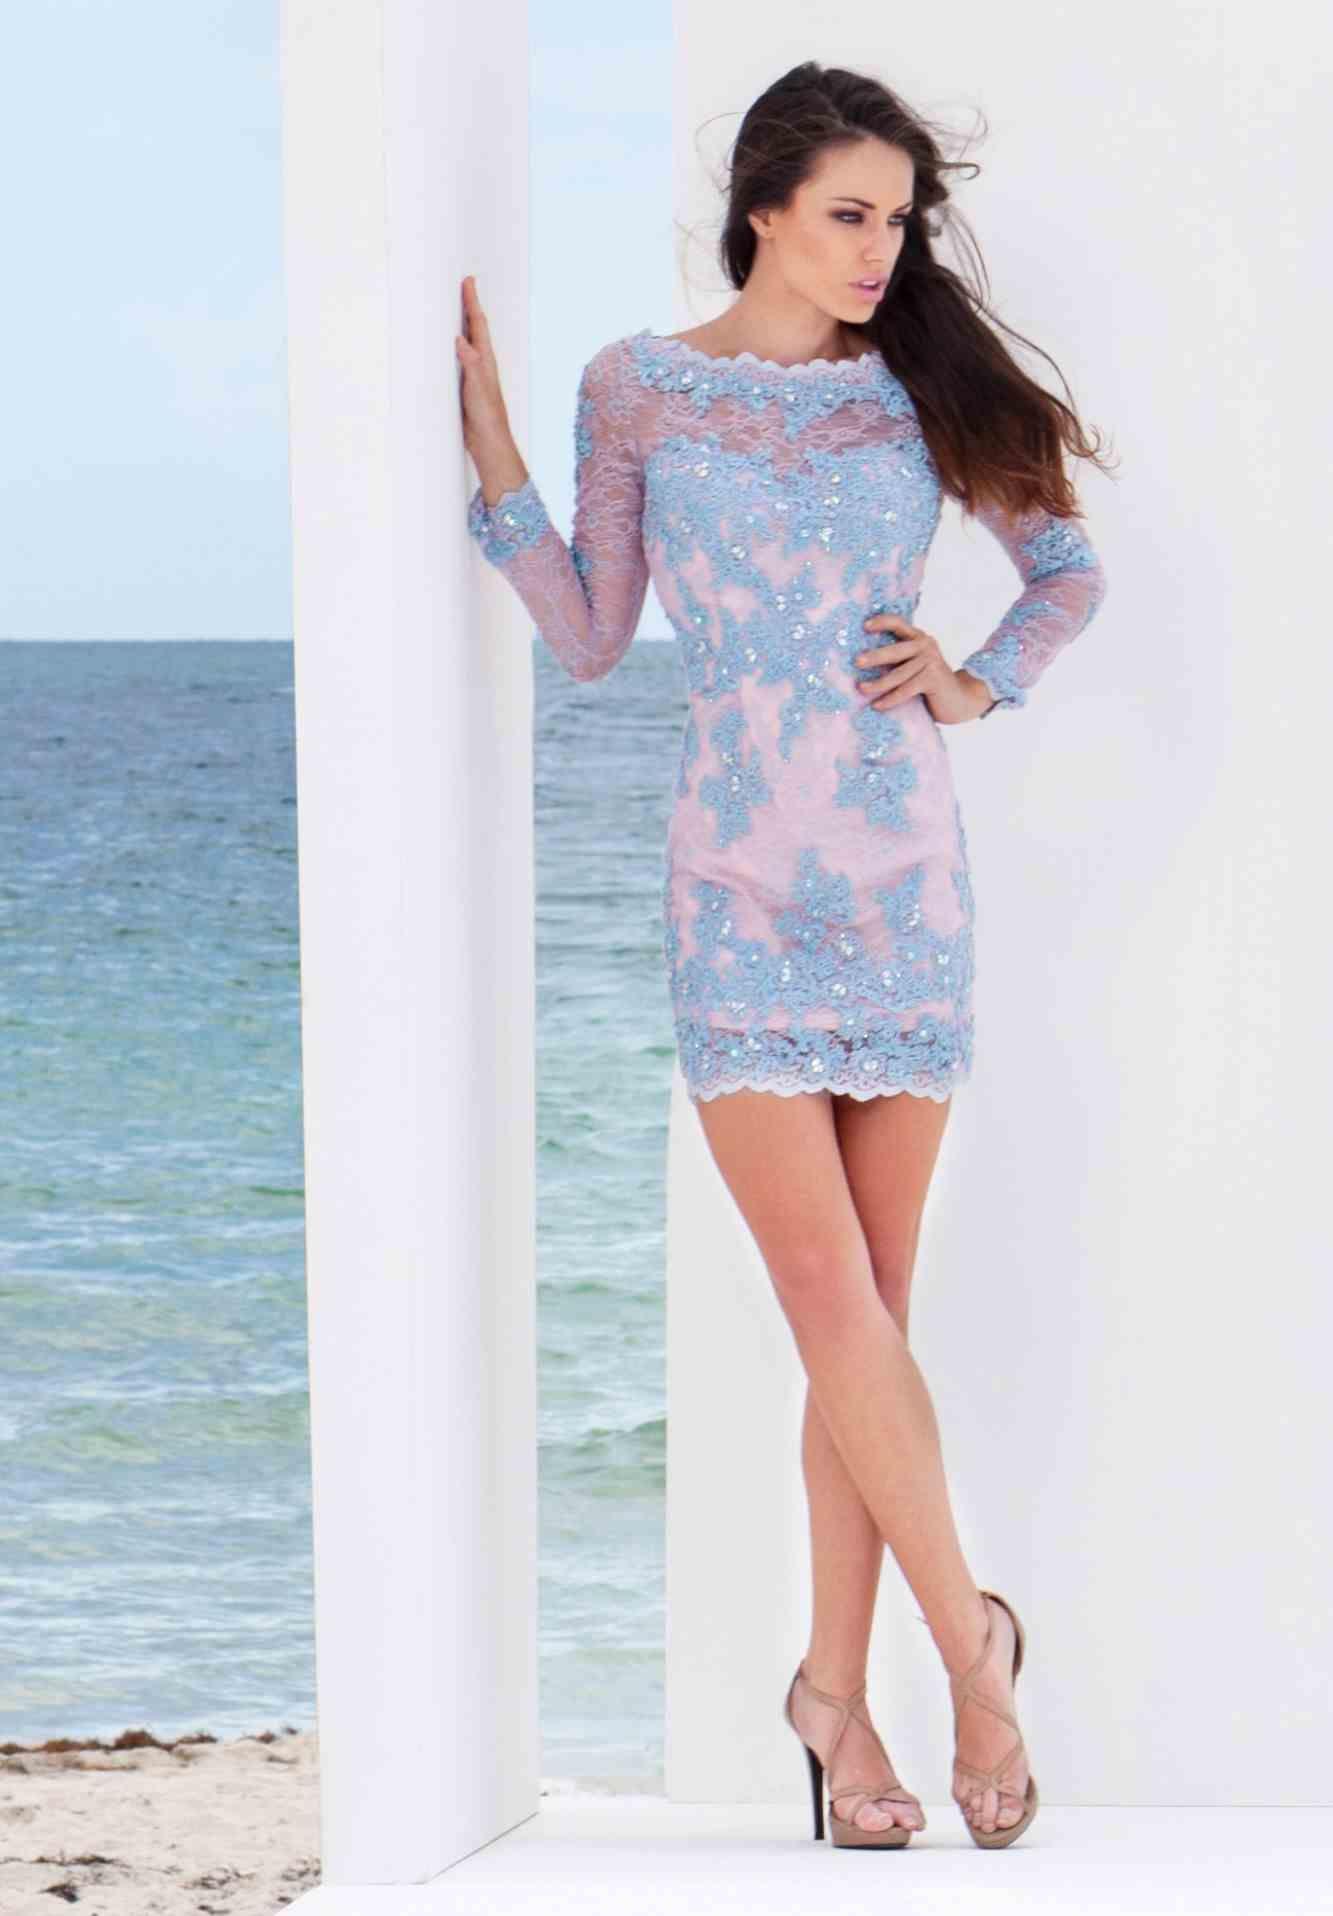 Fabulous Wedding Guest Dresses 2015 UK | Sangmaestro